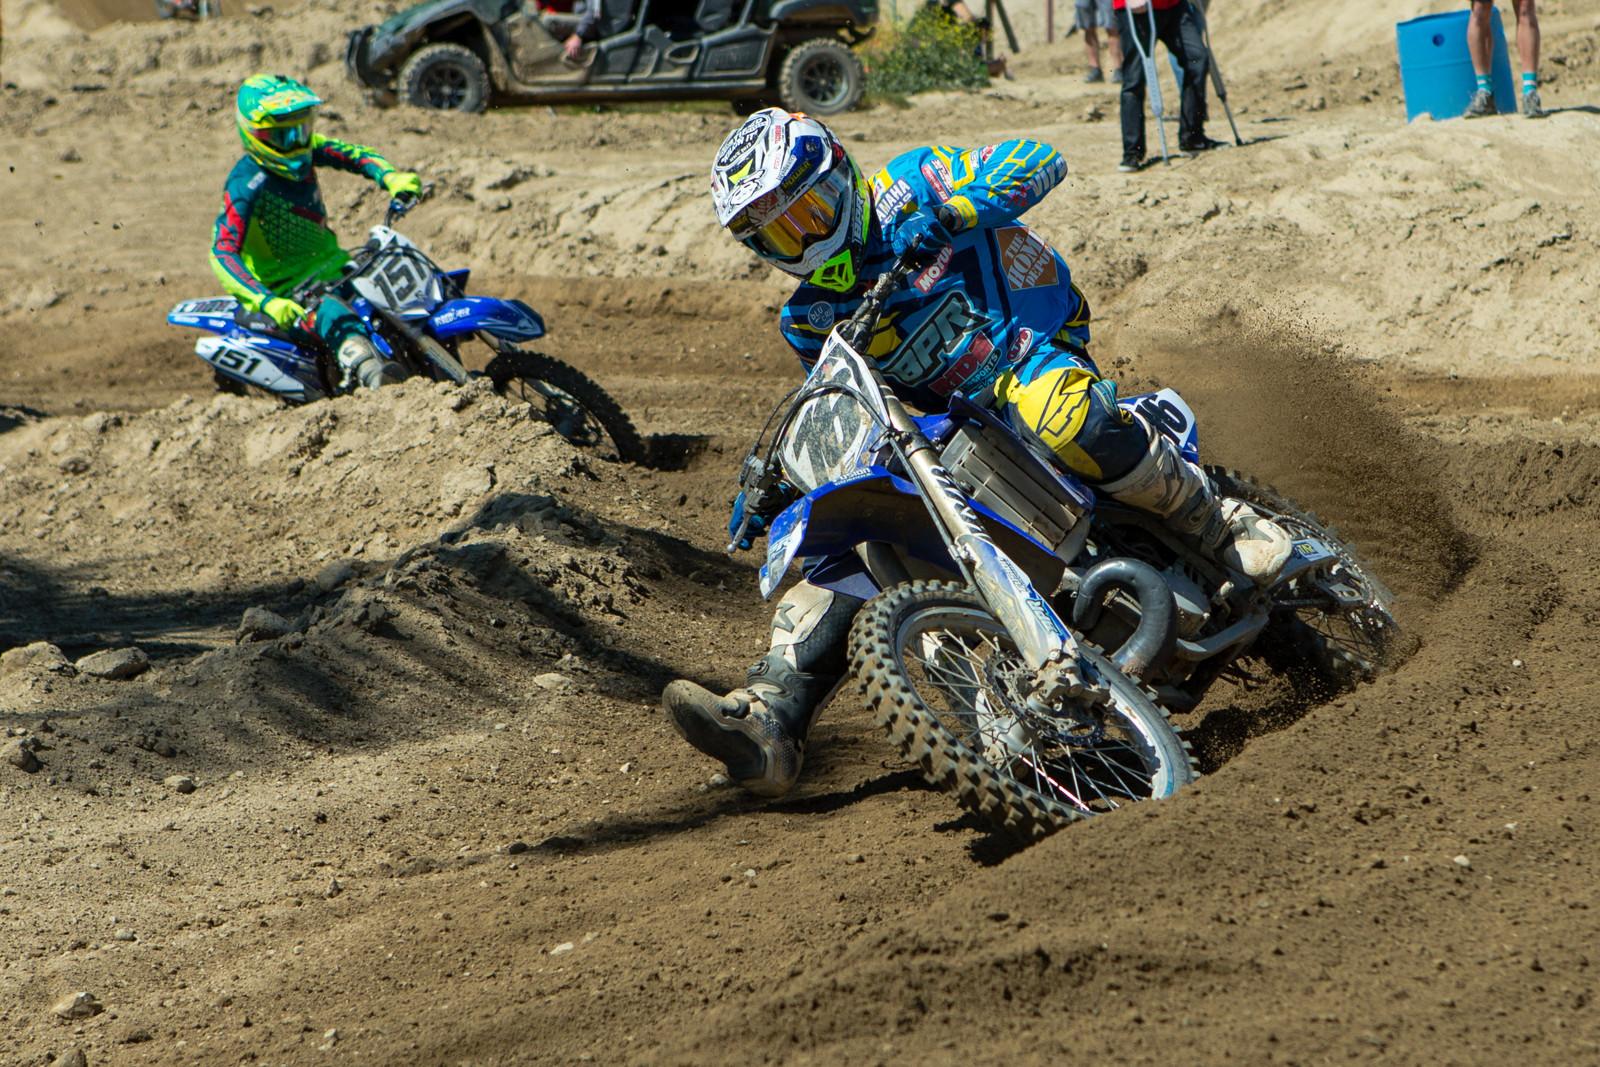 Scott Champion and Ryan Surratt - 2016 MTA World Two-Stroke Nationals - Motocross Pictures - Vital MX